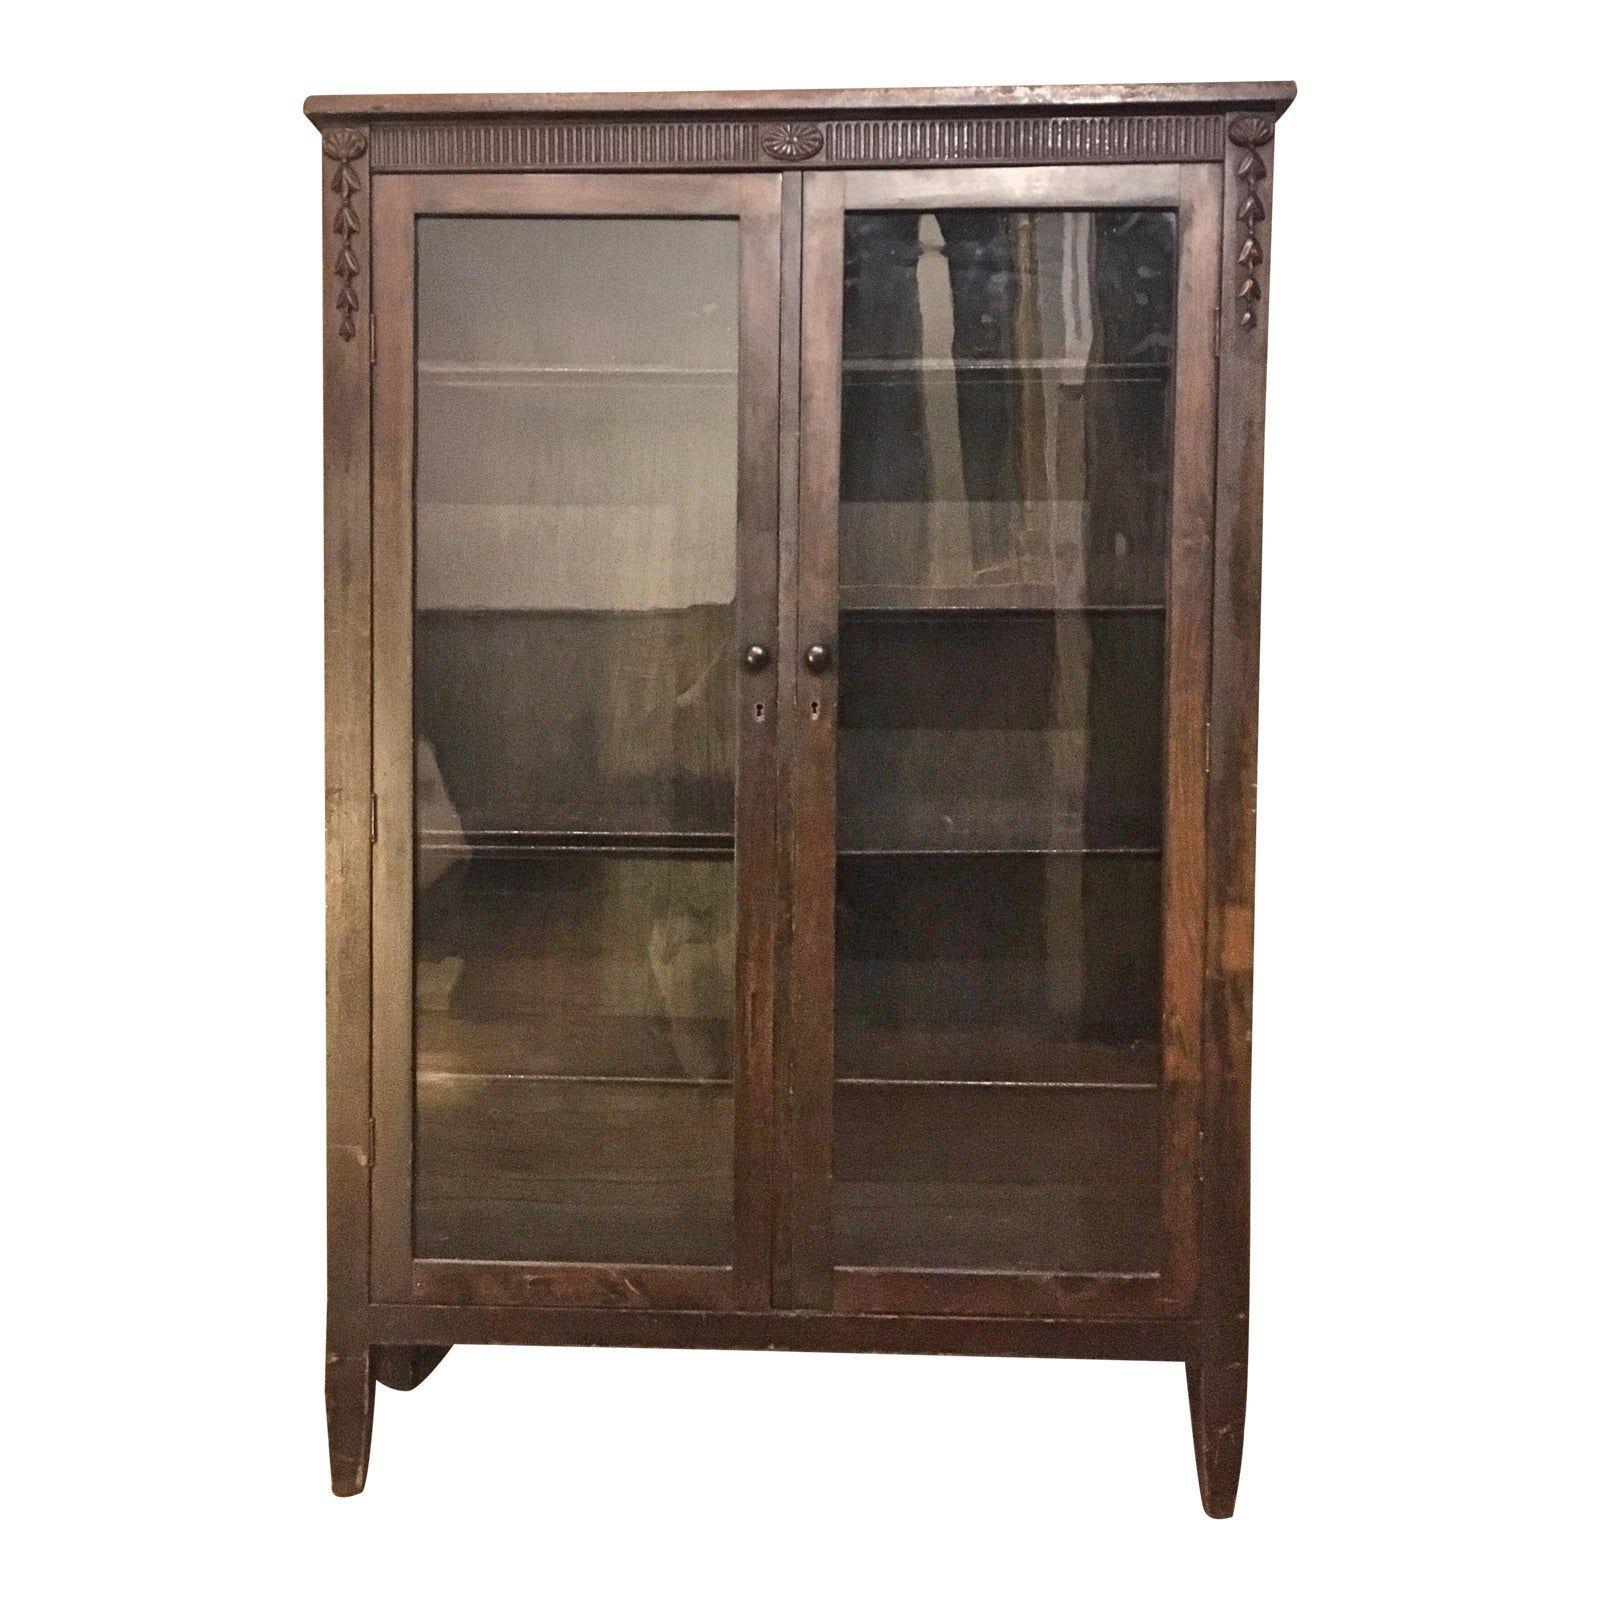 1920s Glass Door Mahogany Bookcase Chairish in 2020